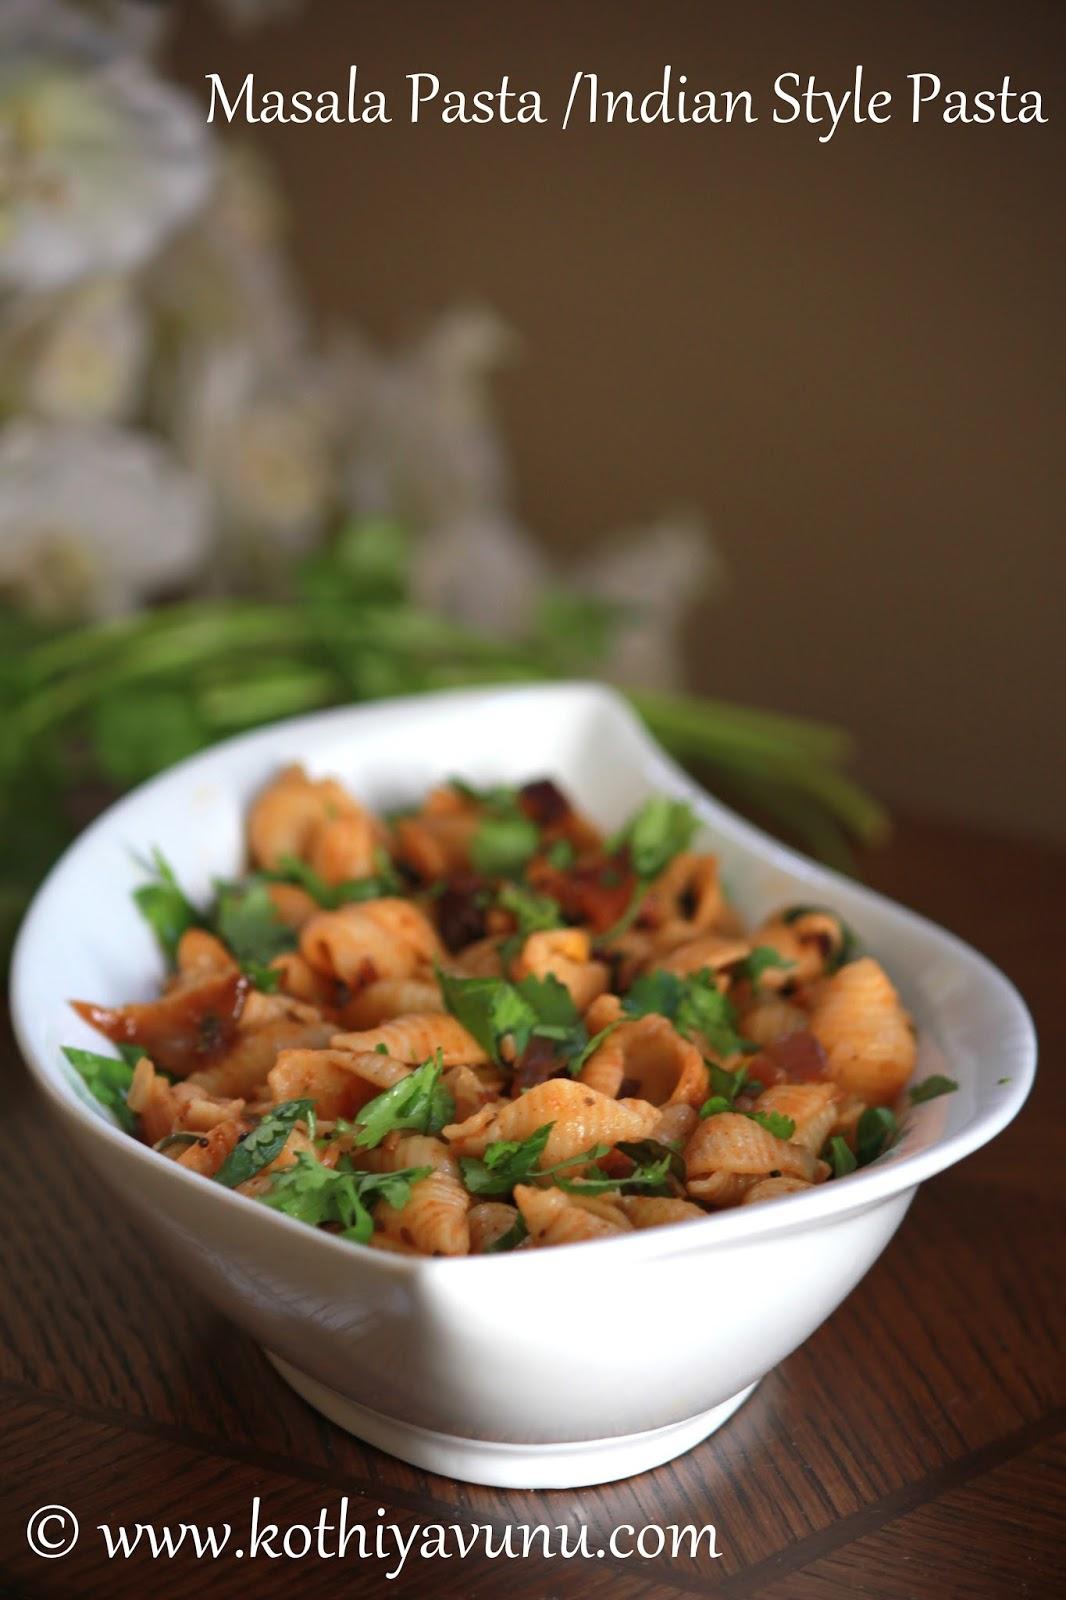 Masala pasta recipe indian style pasta recipe kothiyavunu masala pasta coming to the recipe forumfinder Gallery